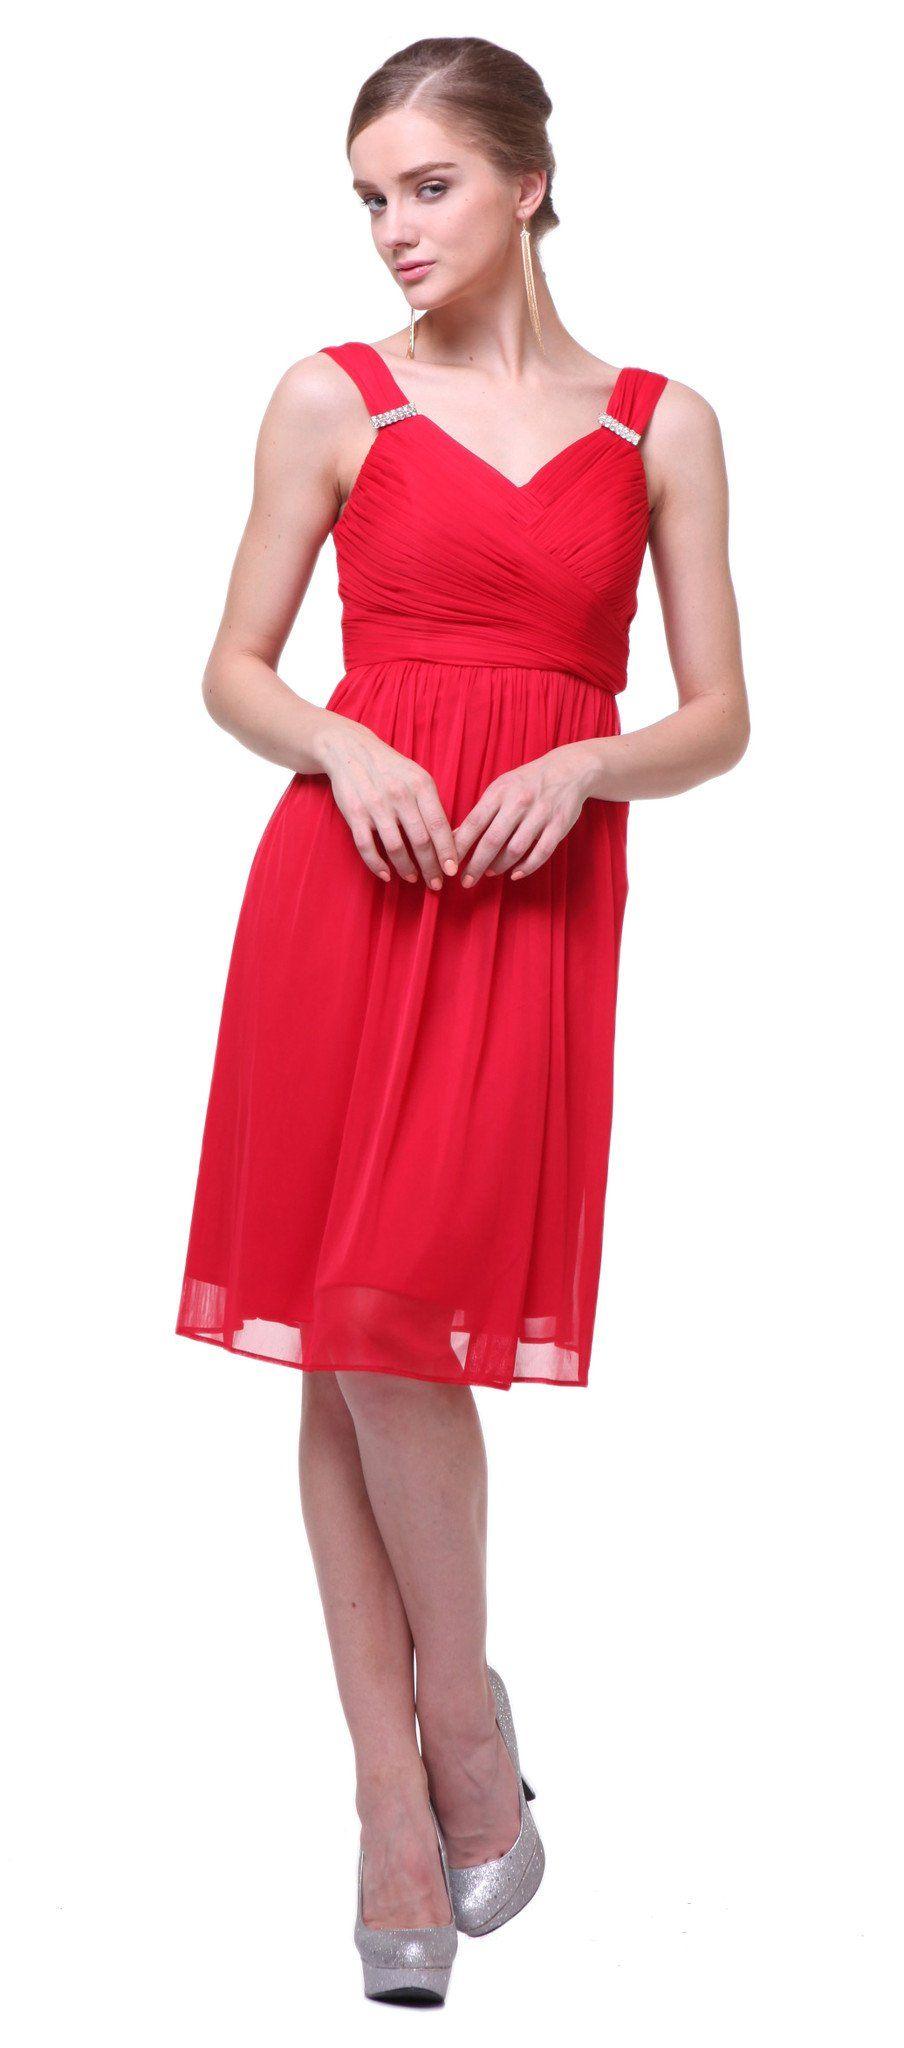 Cd short aline cocktail dress has v neckline products